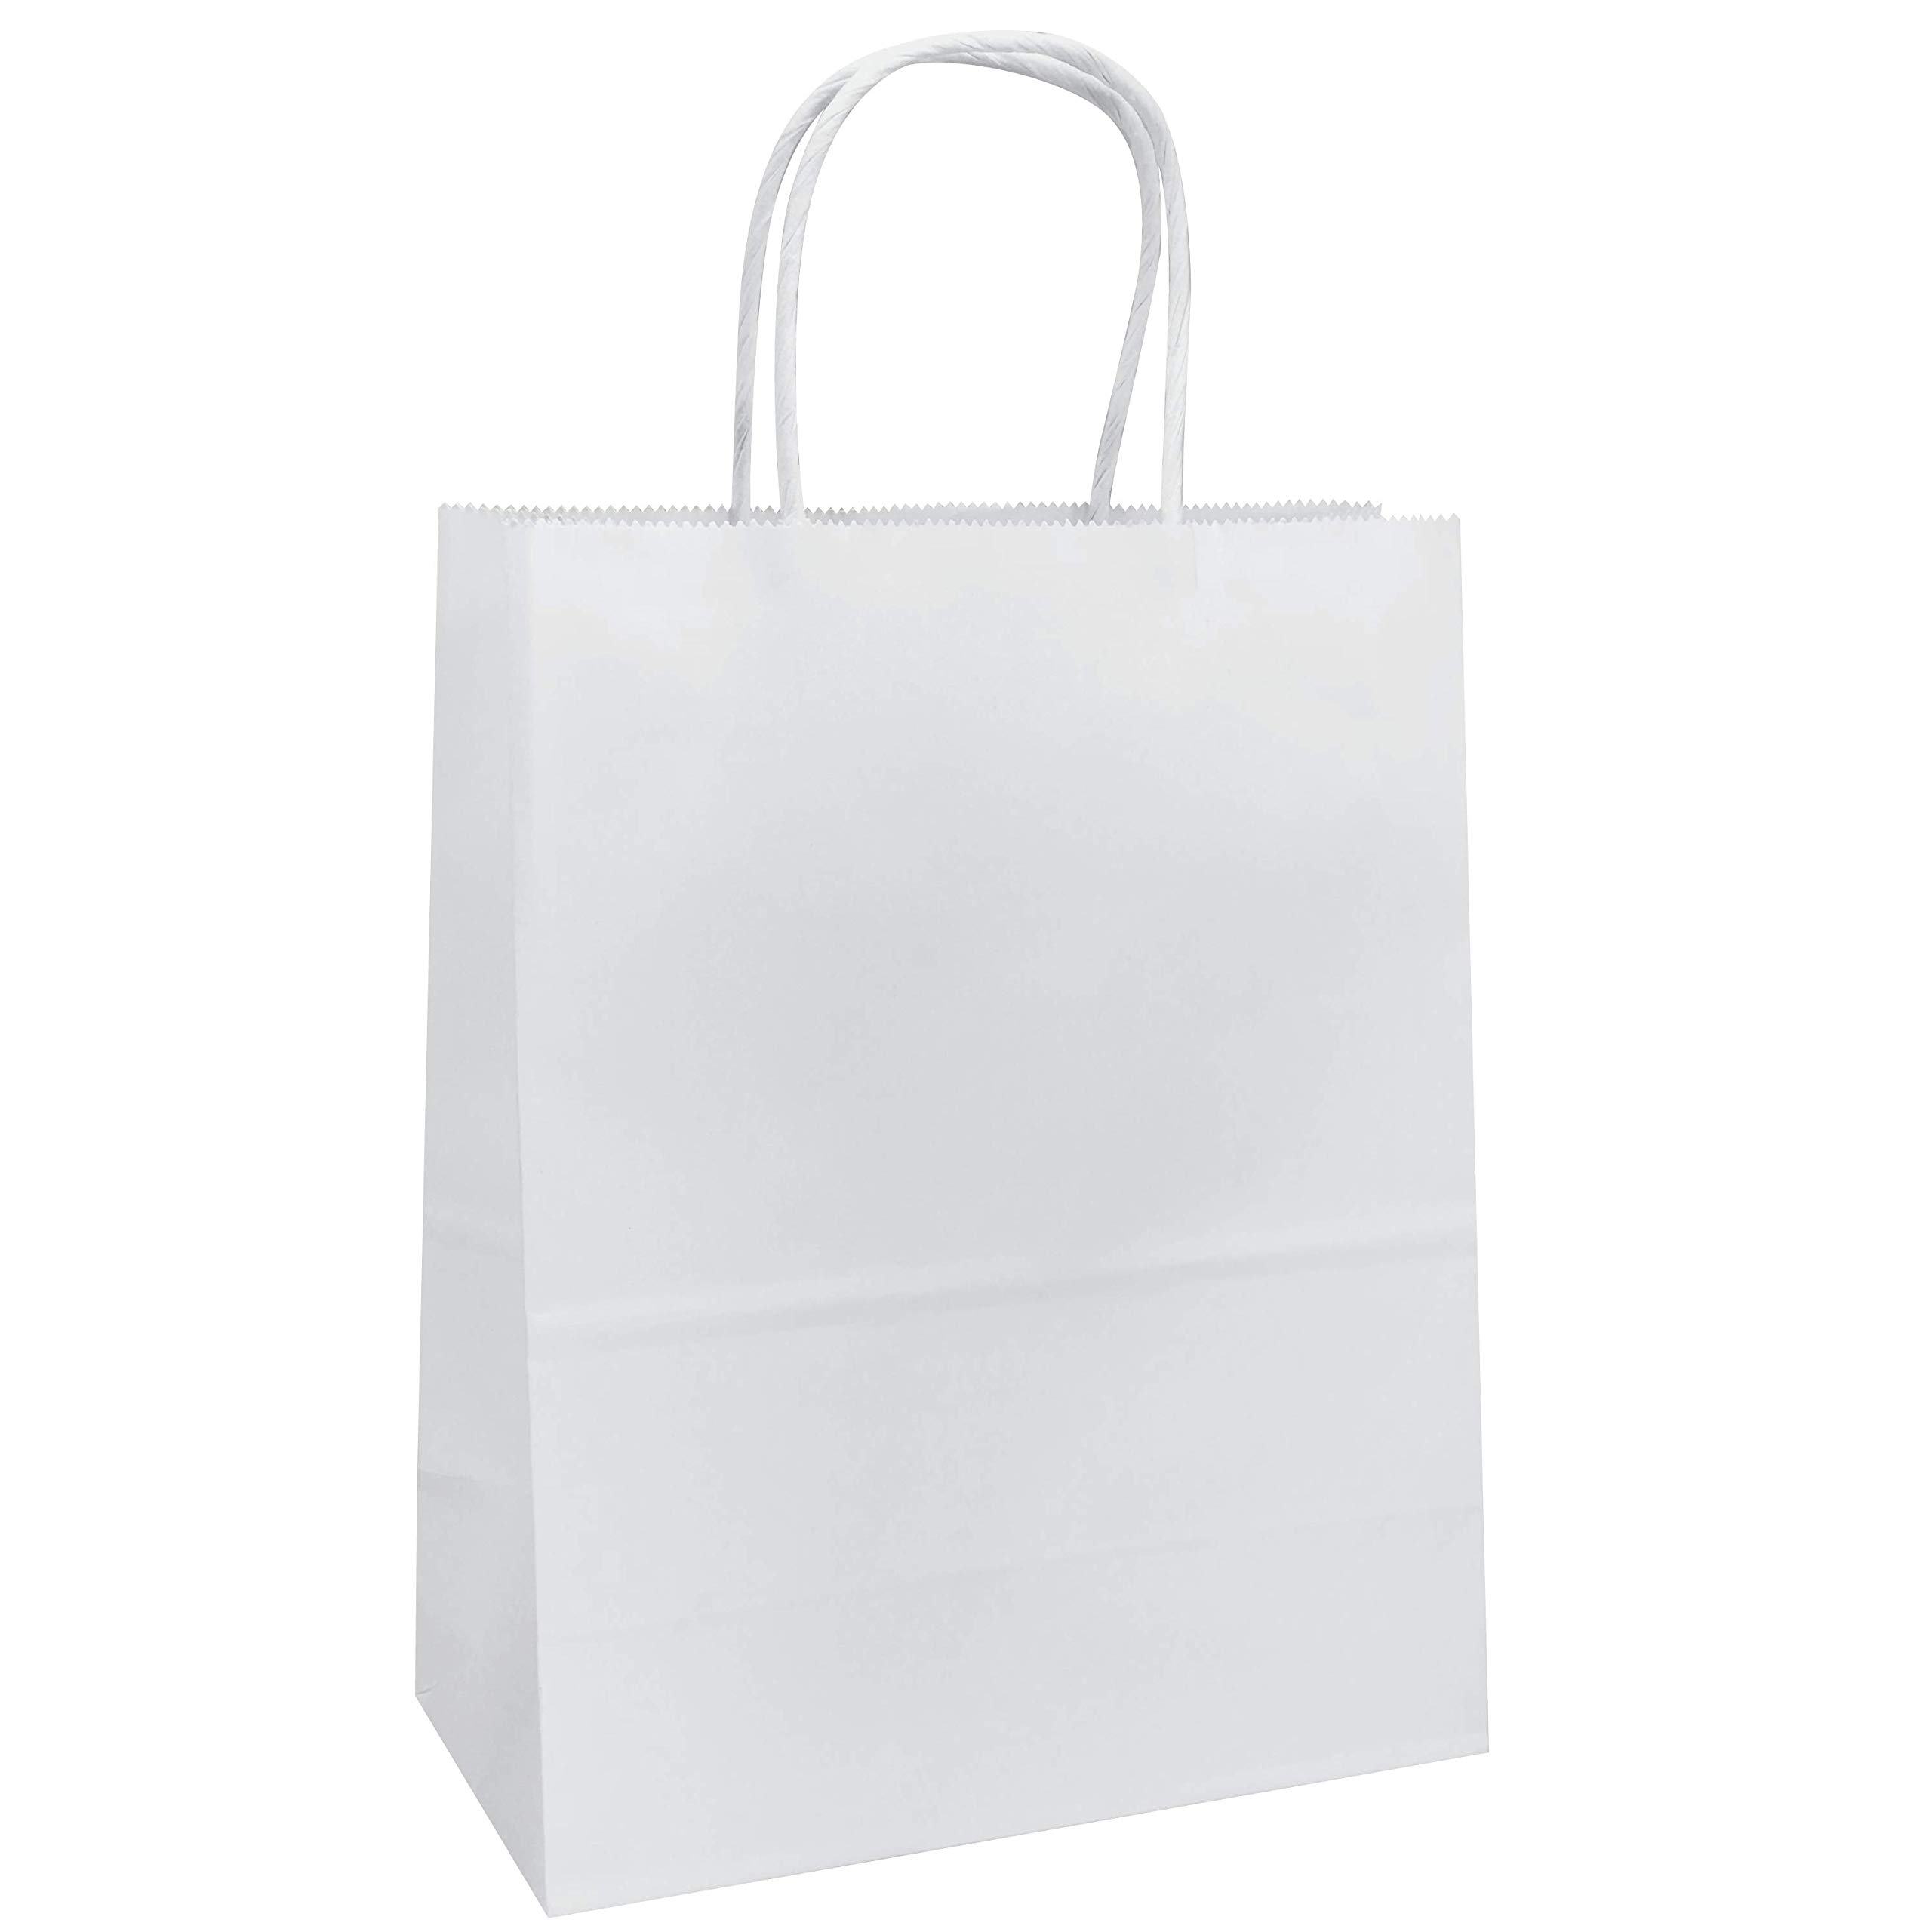 8''x4.75''x10'' -White Kraft Paper Bags Shopping Merchandise Party Gift Bags (100, Plain)